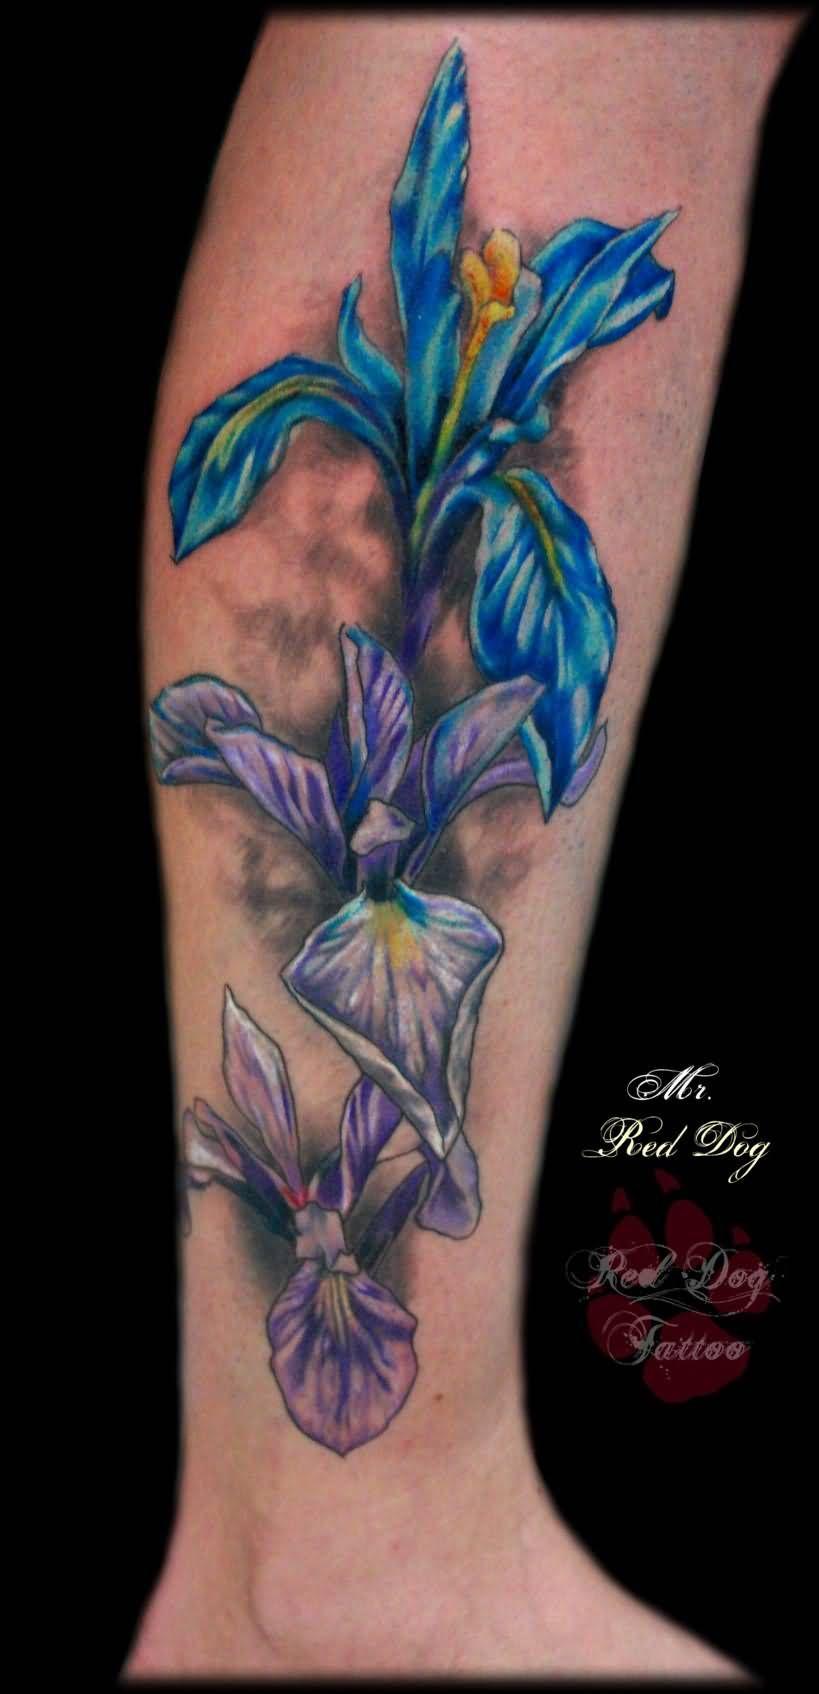 Colored 3d iris tattoo on leg tattoo pinterest iris tattoo colored 3d iris tattoo on leg izmirmasajfo Images